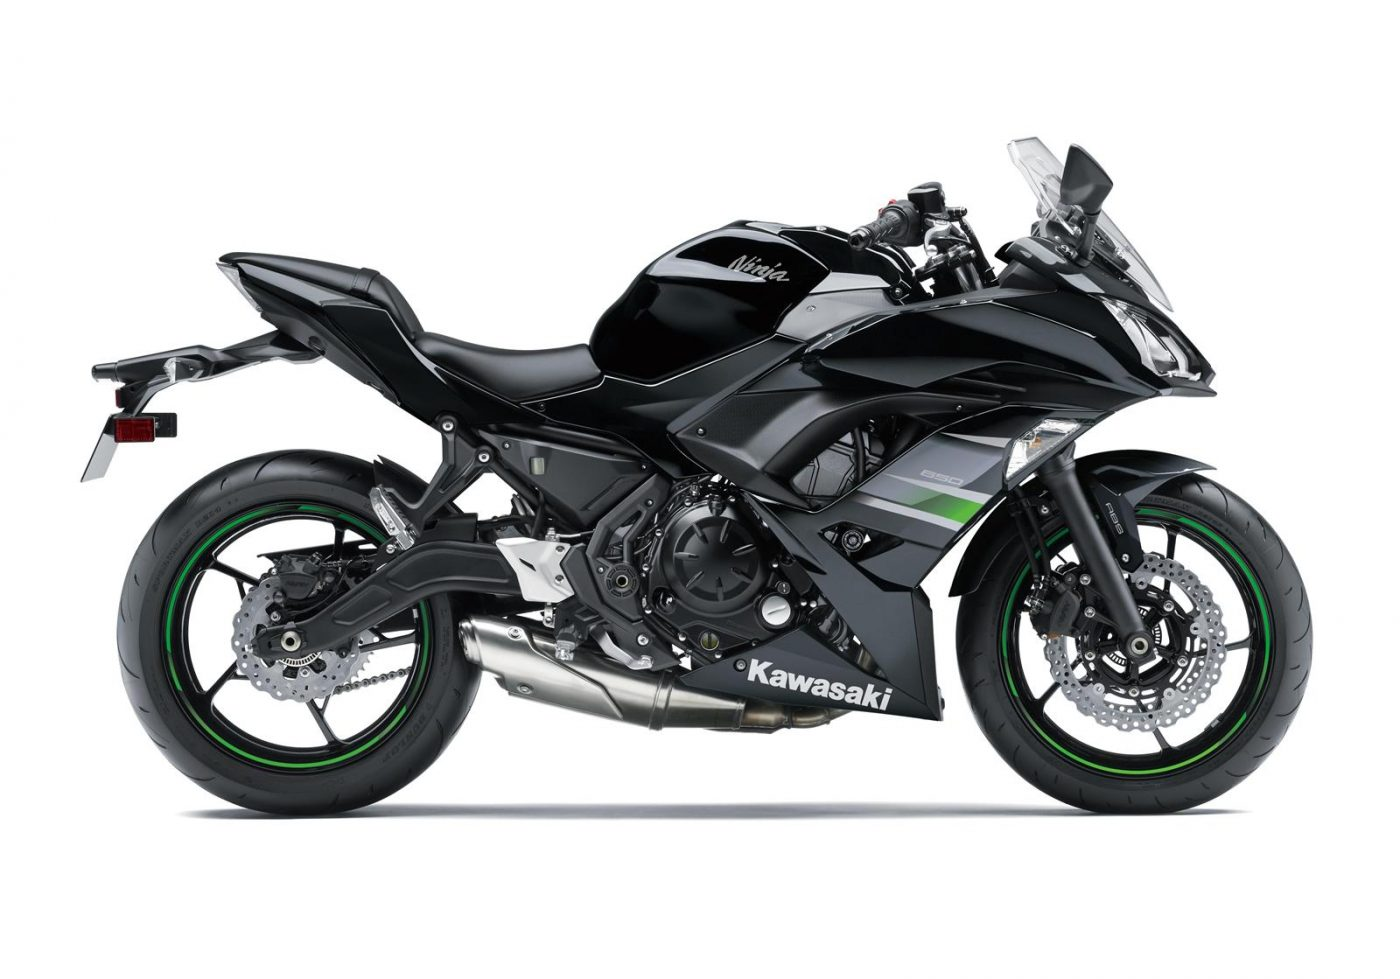 Kawasaki Ninja 650 (2019) Image